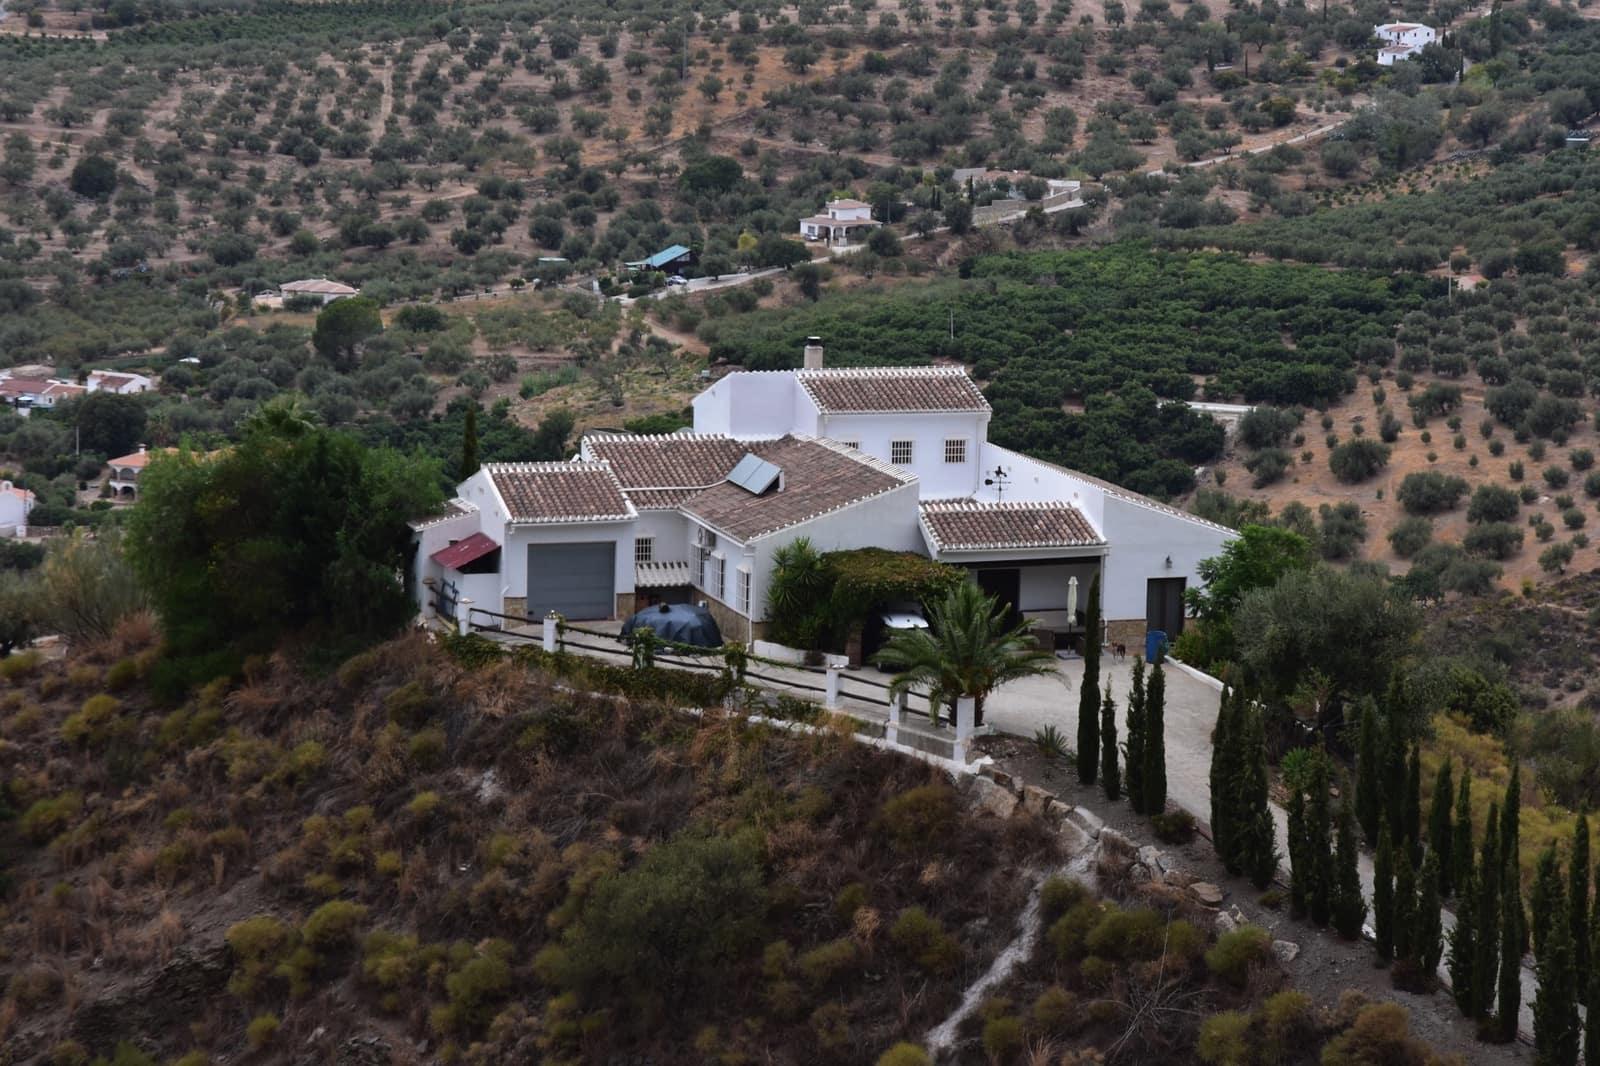 3 bedroom Villa for sale in Alcaucin with pool - € 449,000 (Ref: 4760219)